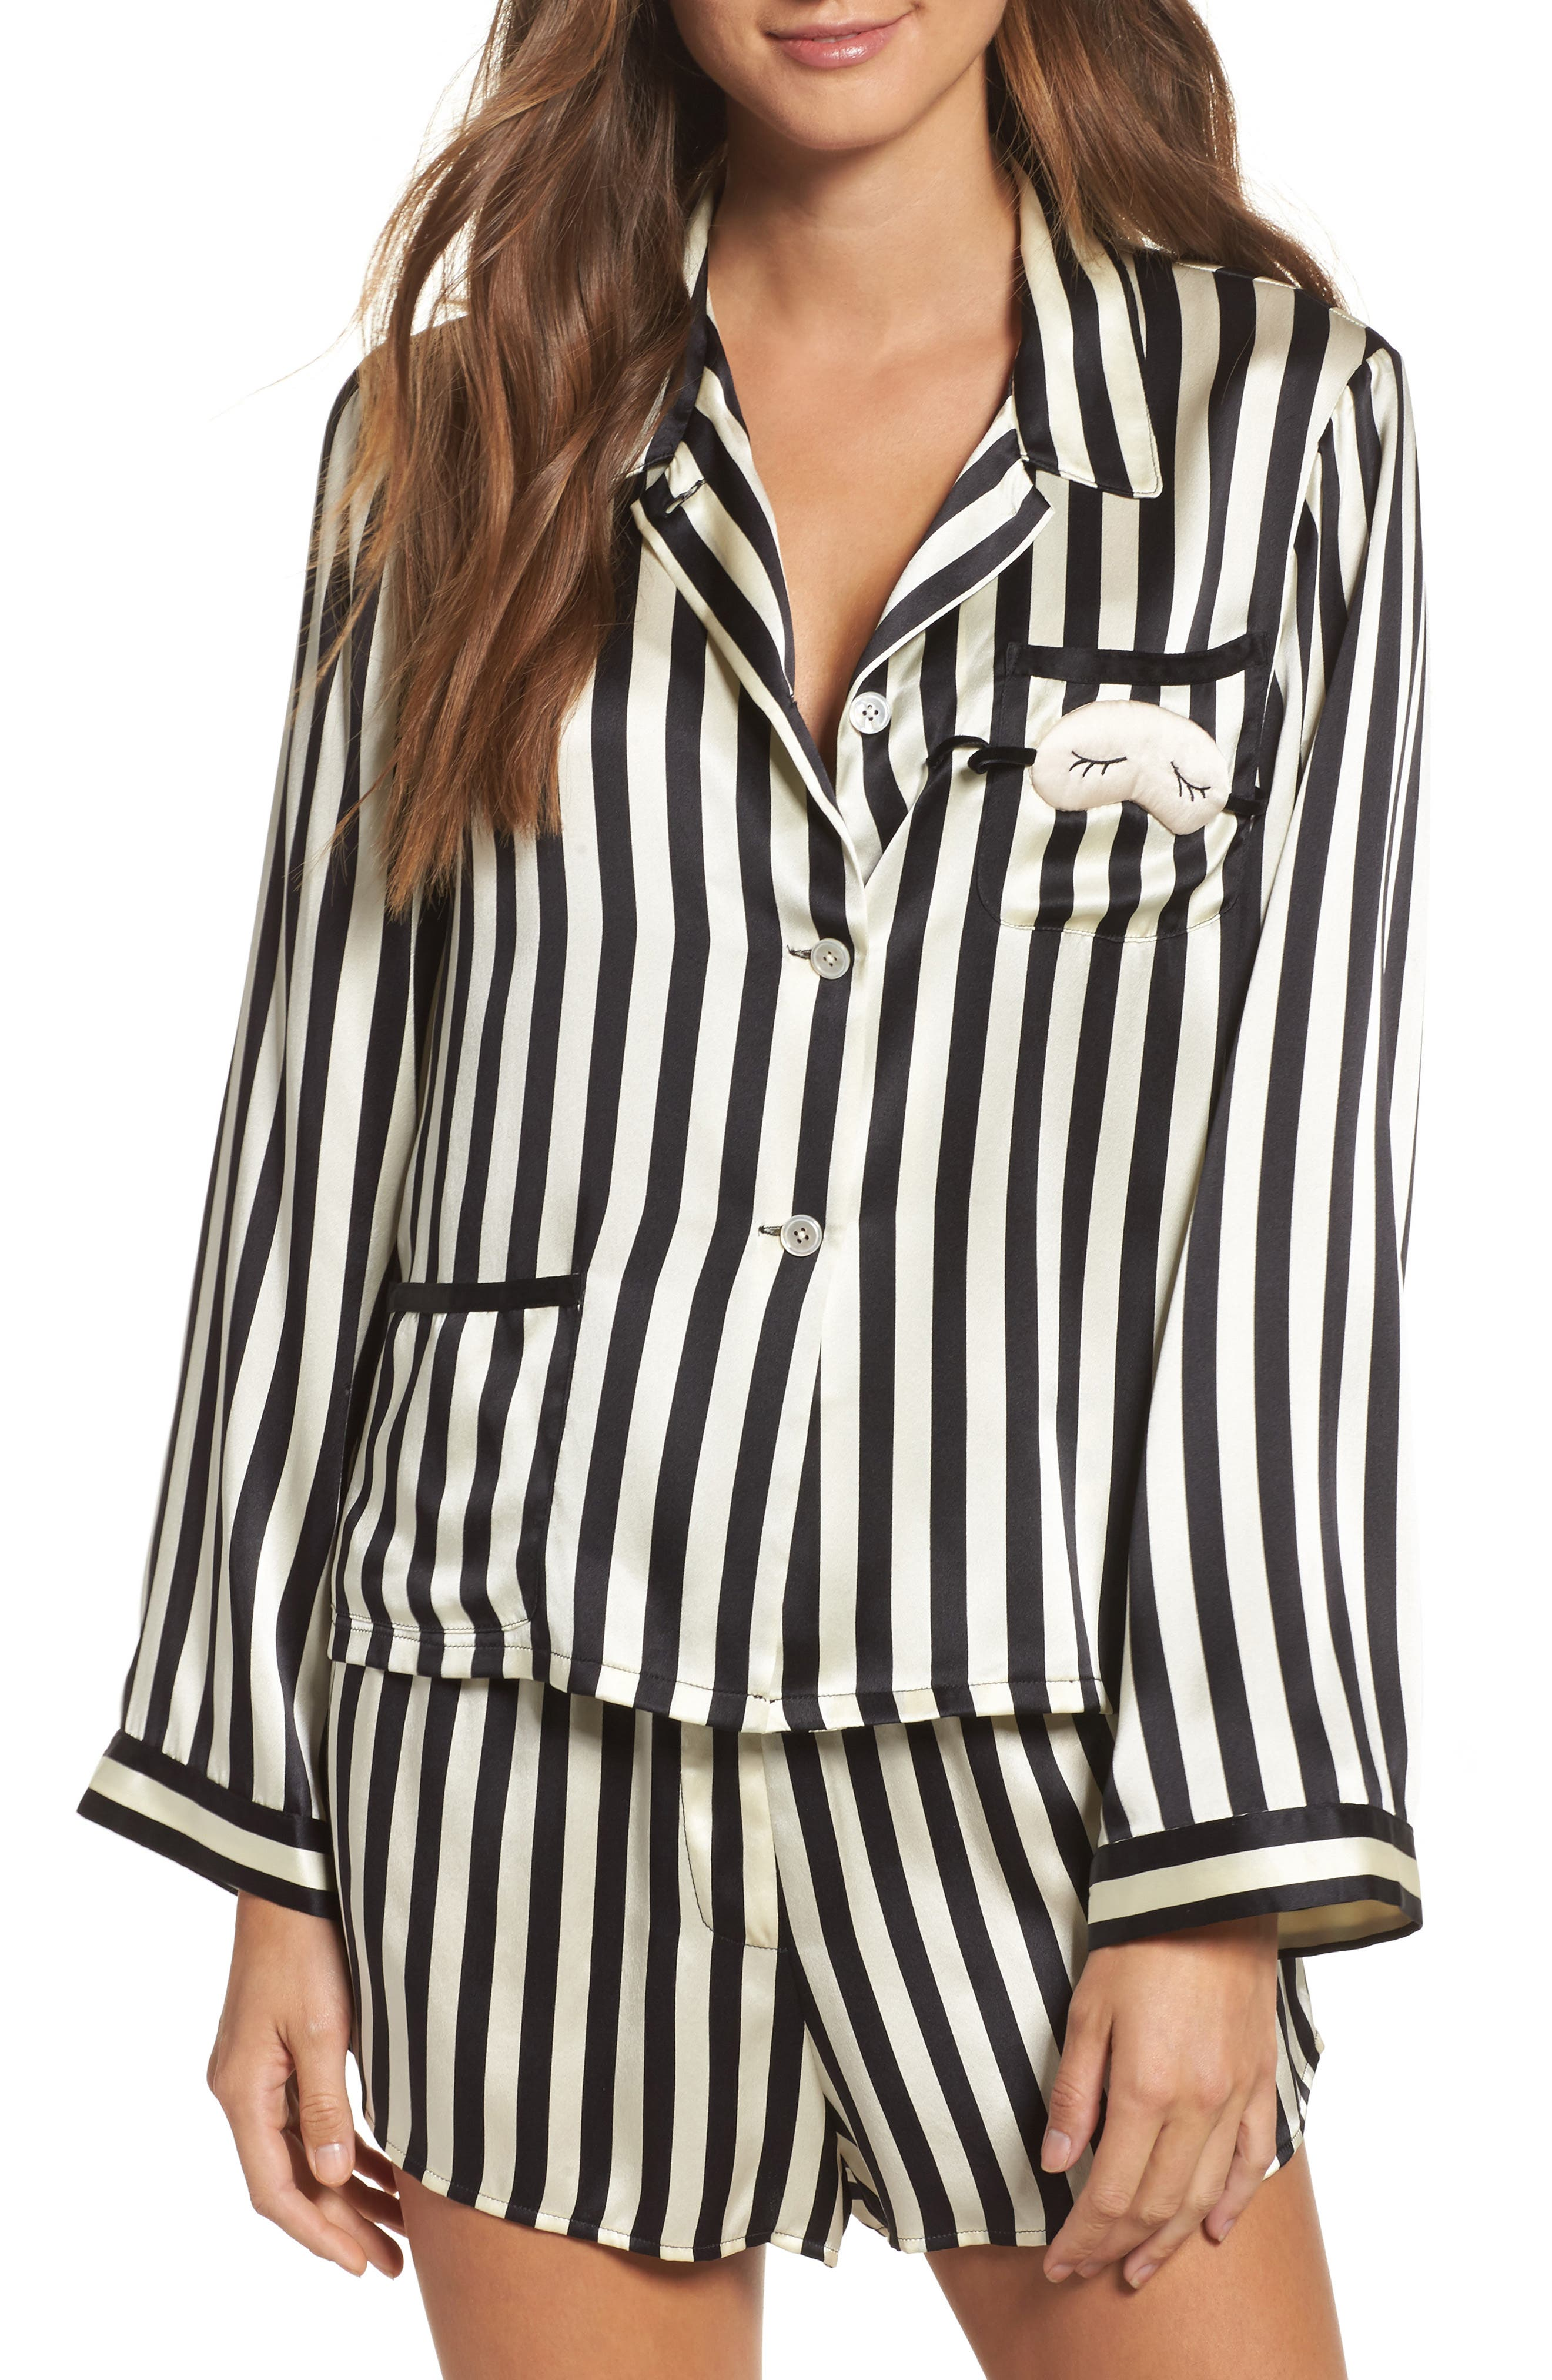 x Amanda Fatherazi Ruthie Mini Mask Stripe Pajama Top,                             Main thumbnail 1, color,                             Noir/ Ecru